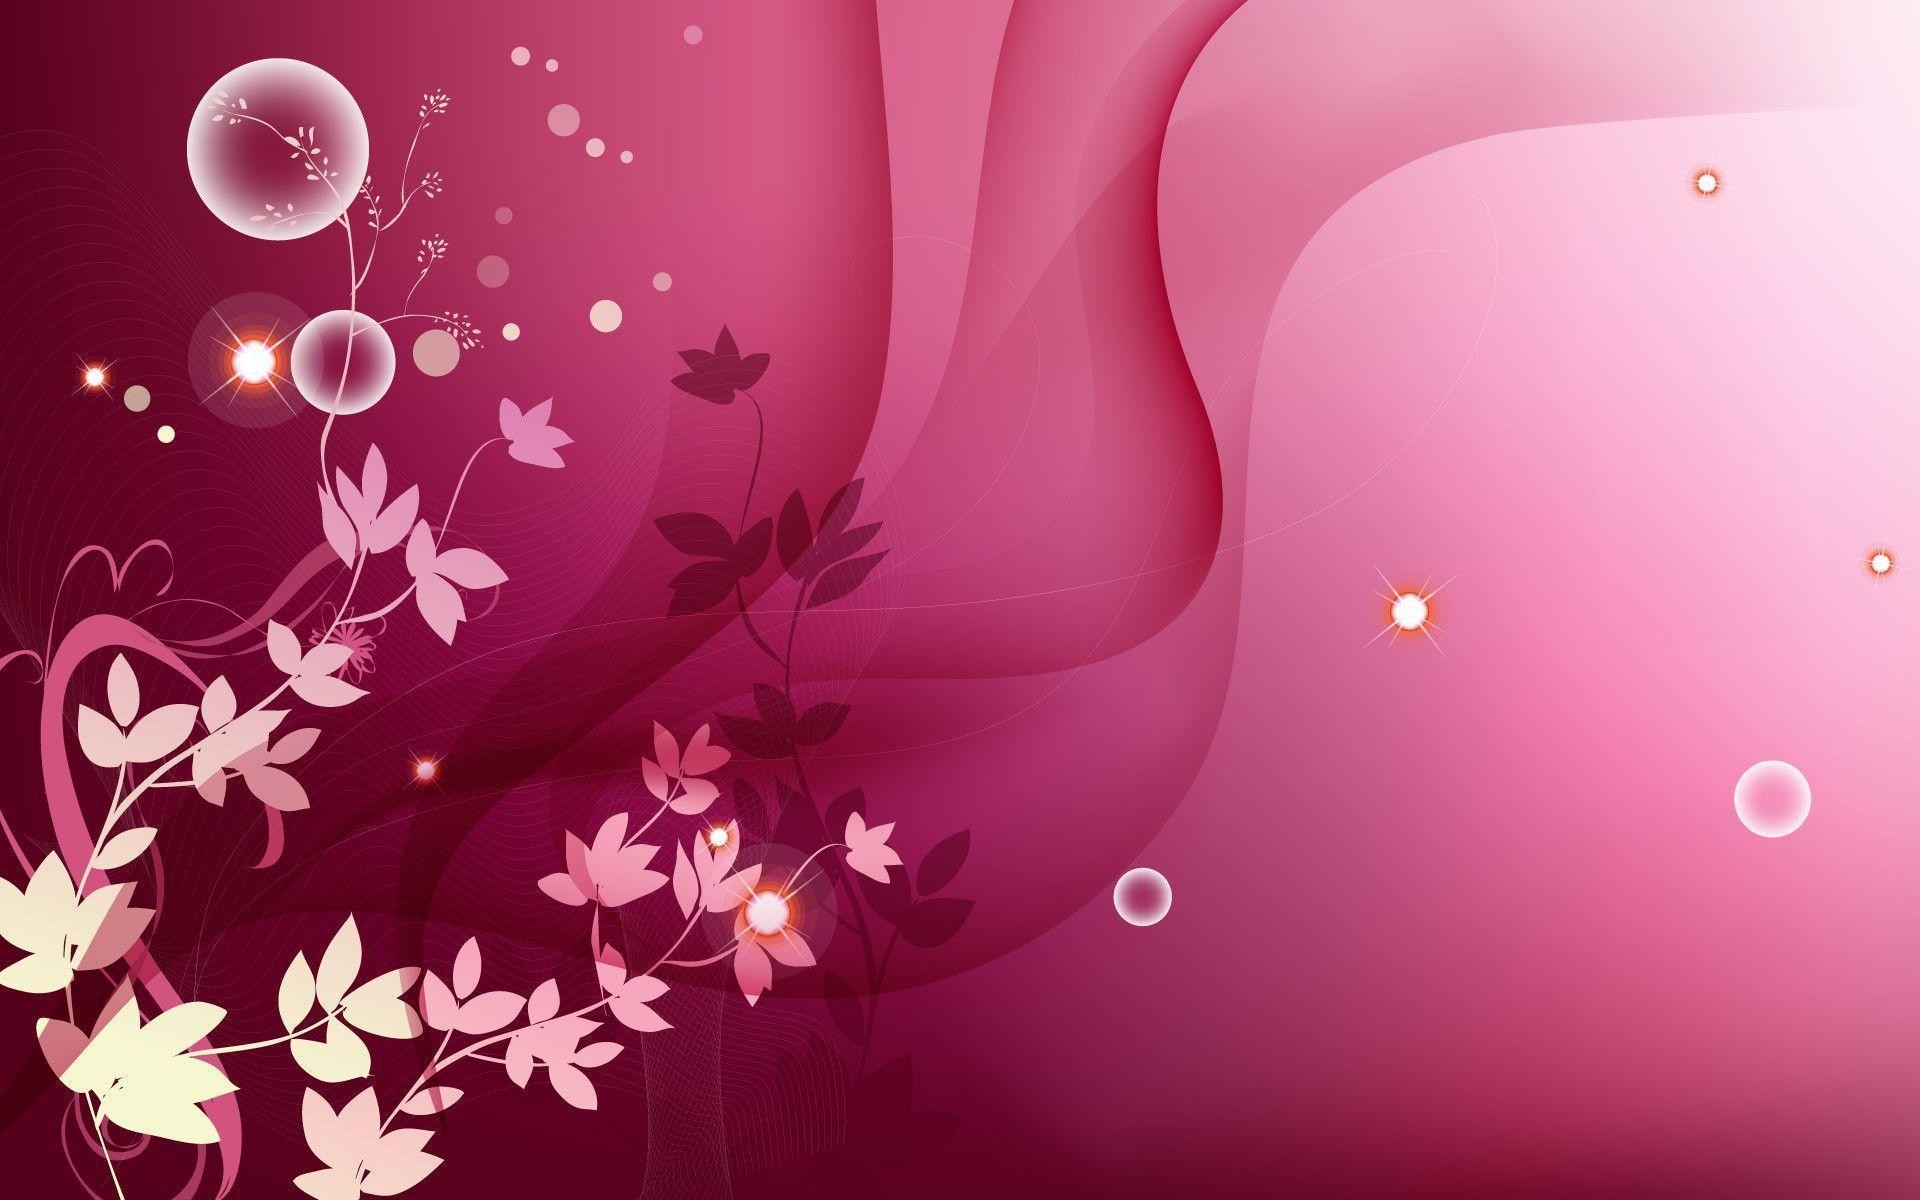 Pink Computer Wallpaper 61 Images